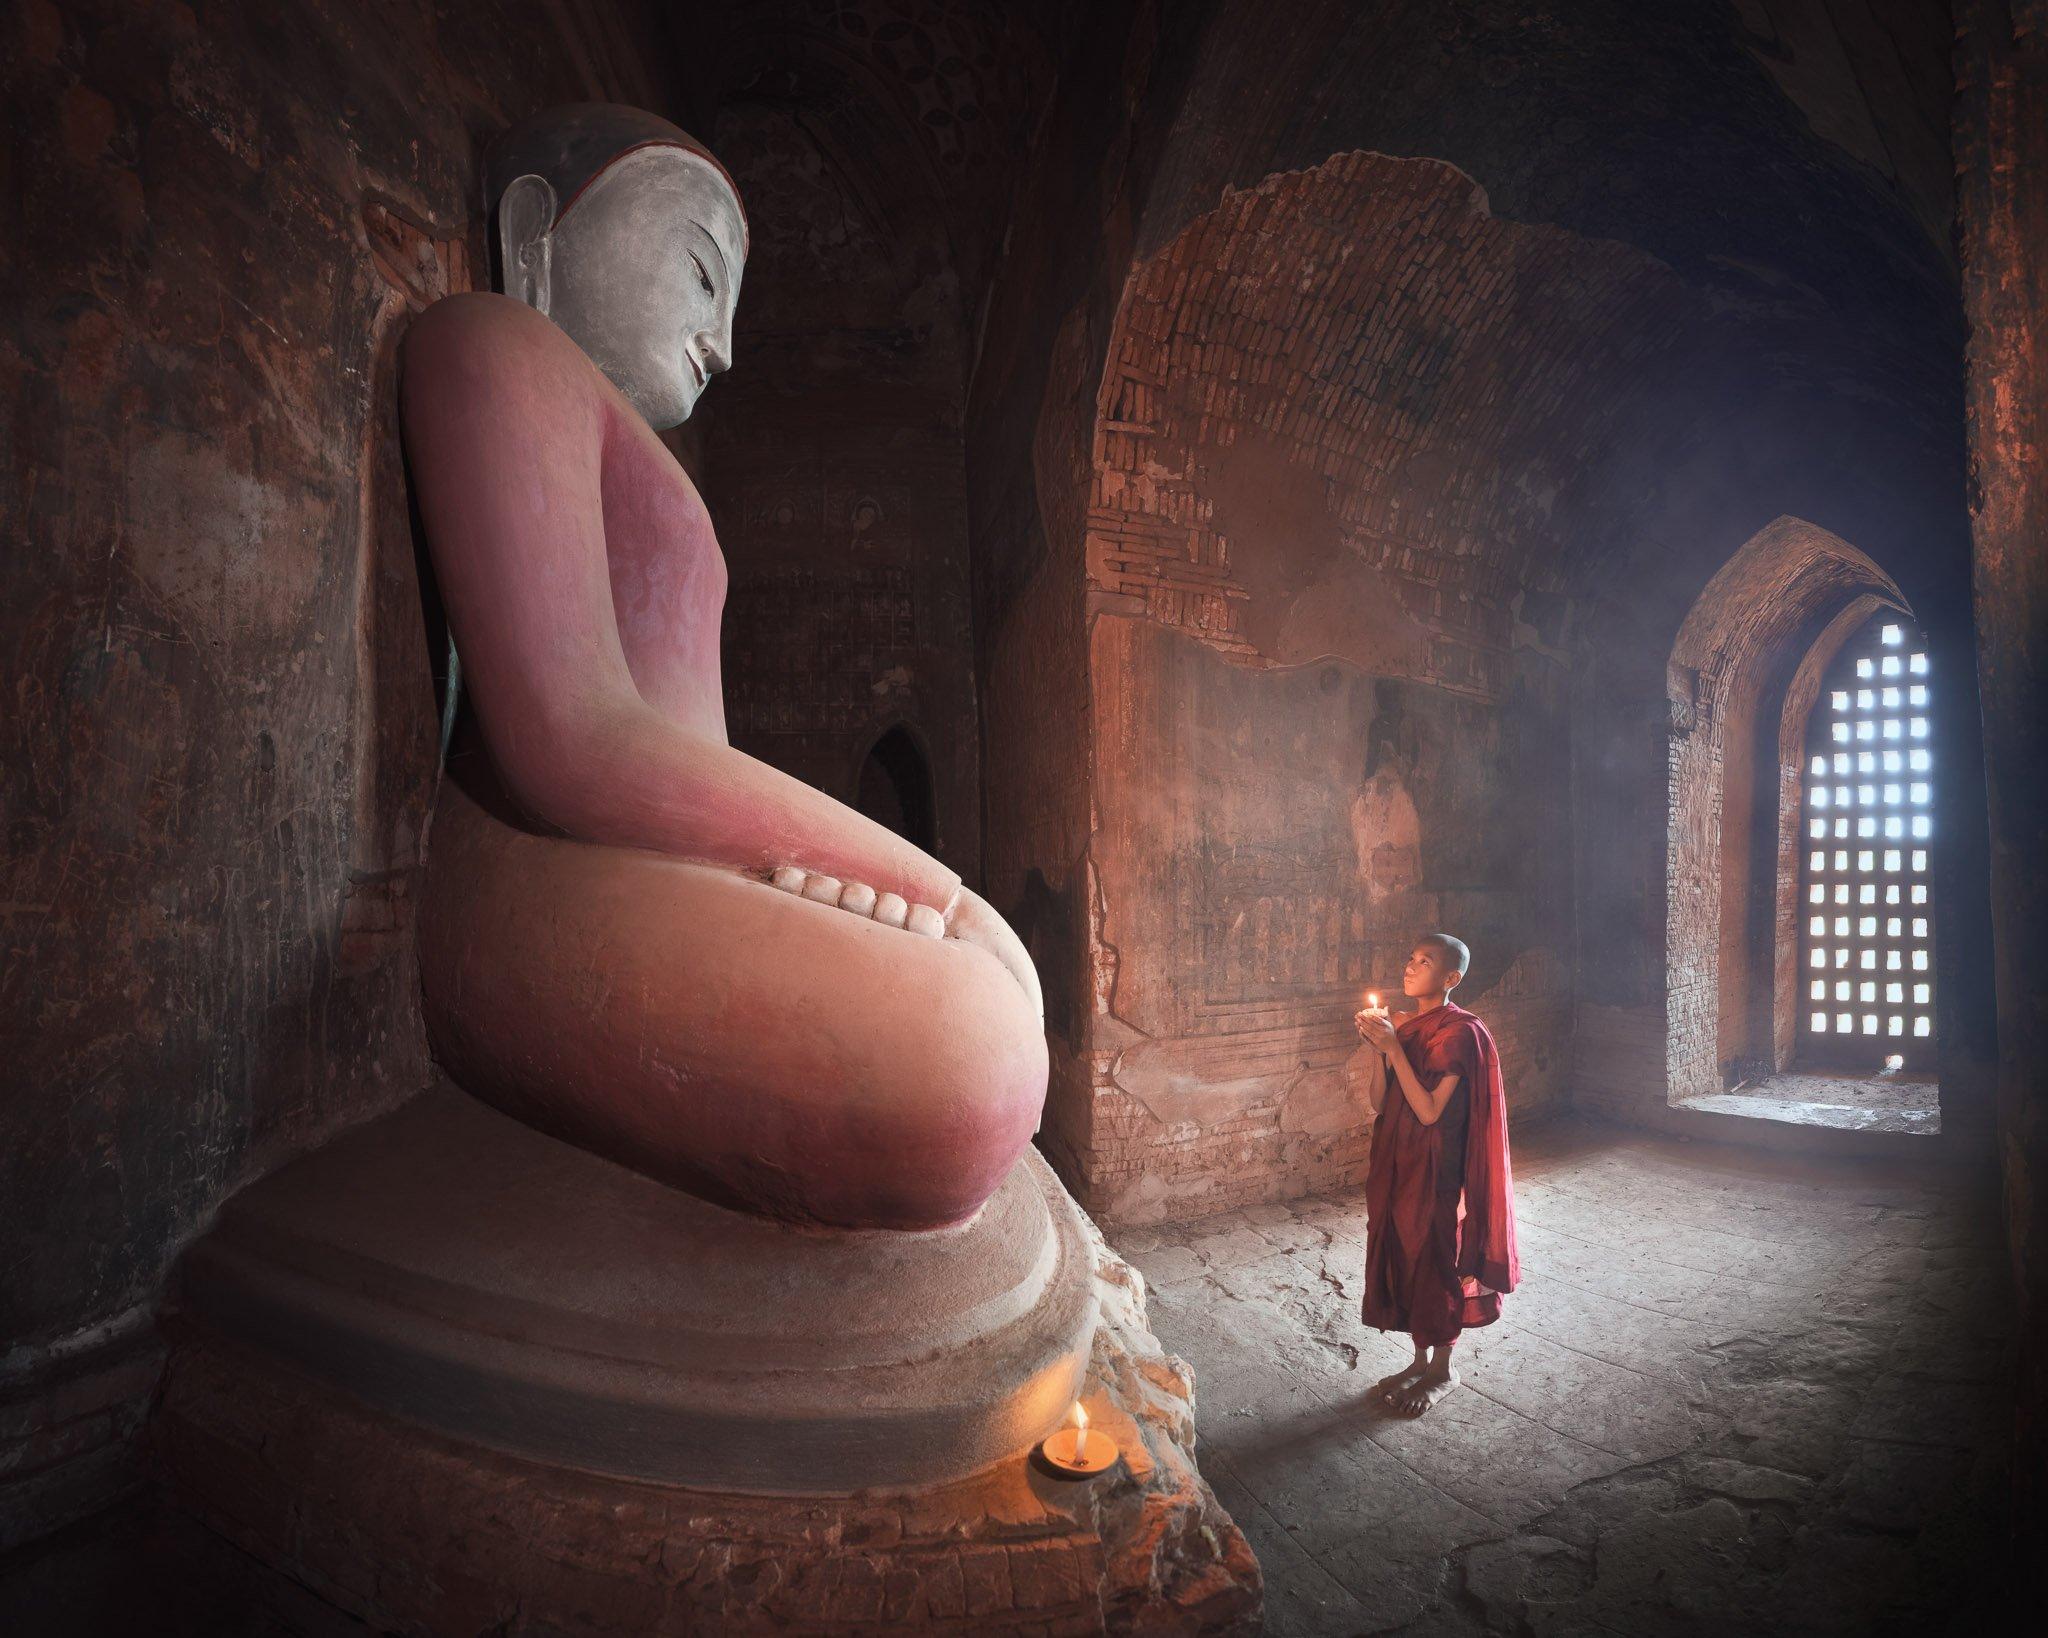 ancient, archeological, architecture, asia, asian, bagan, belief, buddha, buddhism, buddhist, burma, burmese, candle, children, culture, destination, faith, history, inside, interior, kid, landmark, light, little, man, meditation, monastery, monk, myanmar, Omelyanchuk Andrey